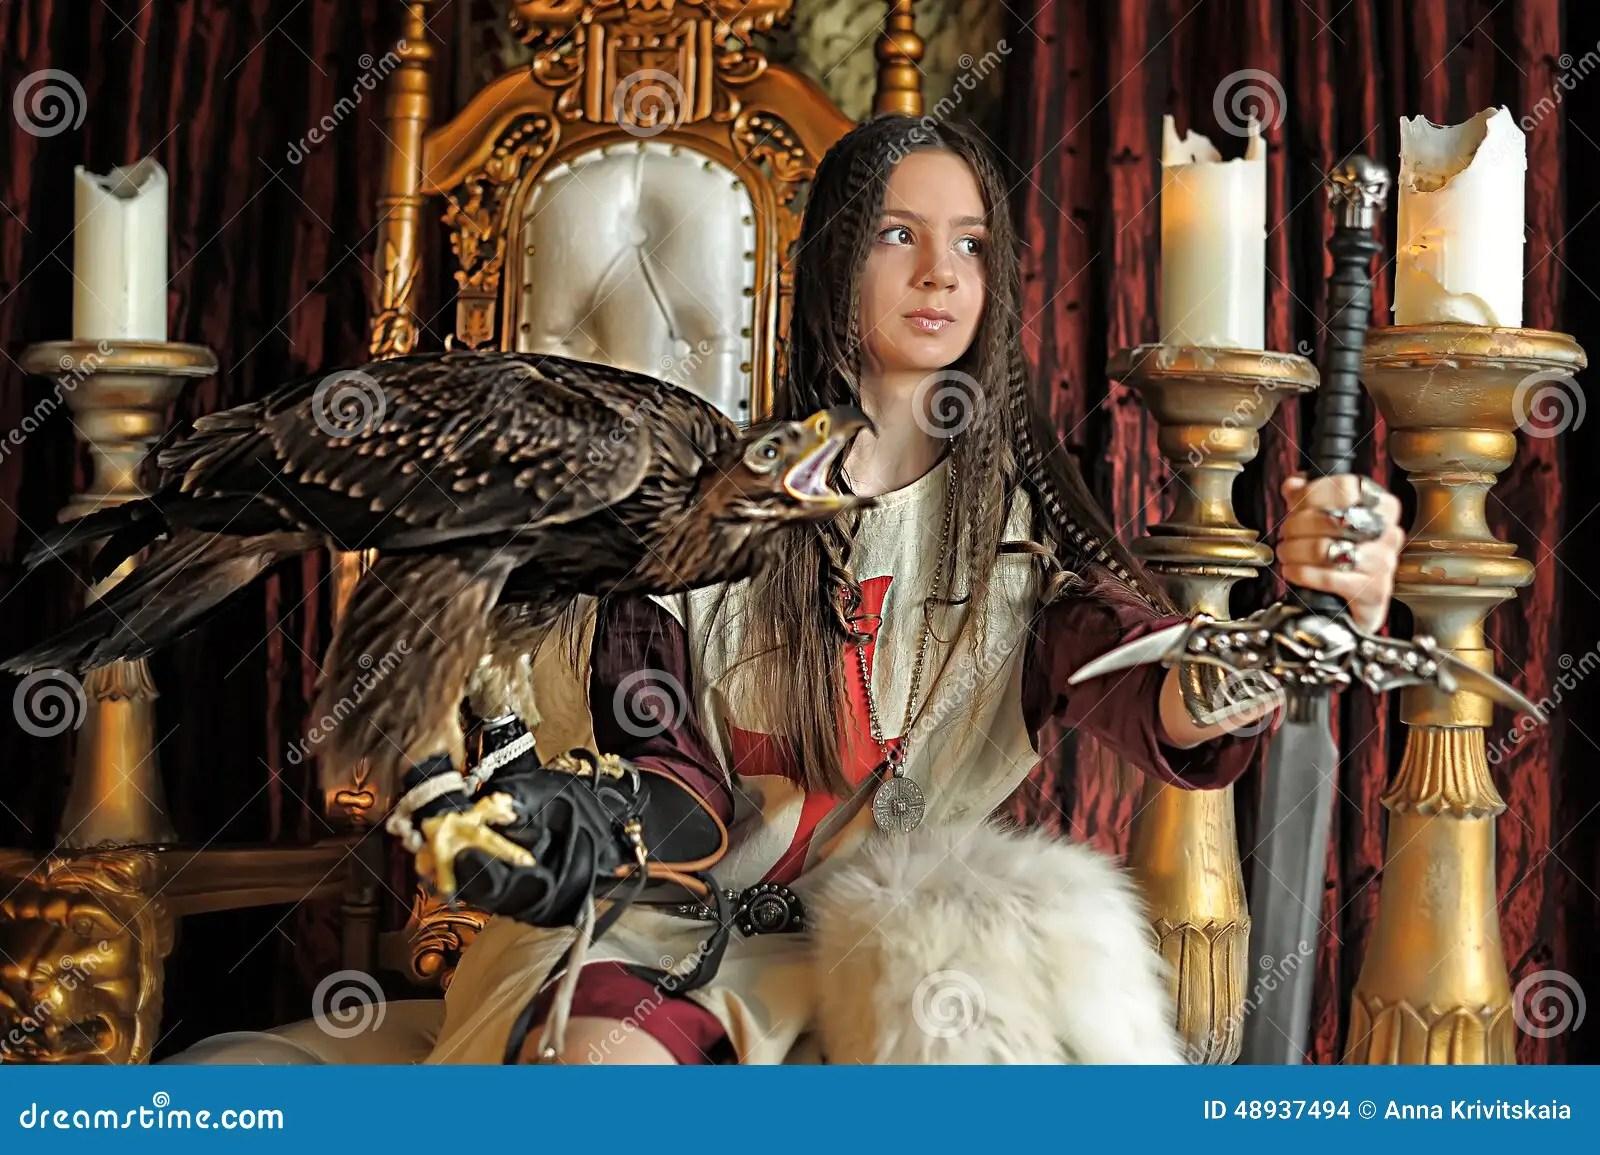 Warrior Princess On The Throne Stock Photo  Image 48937494